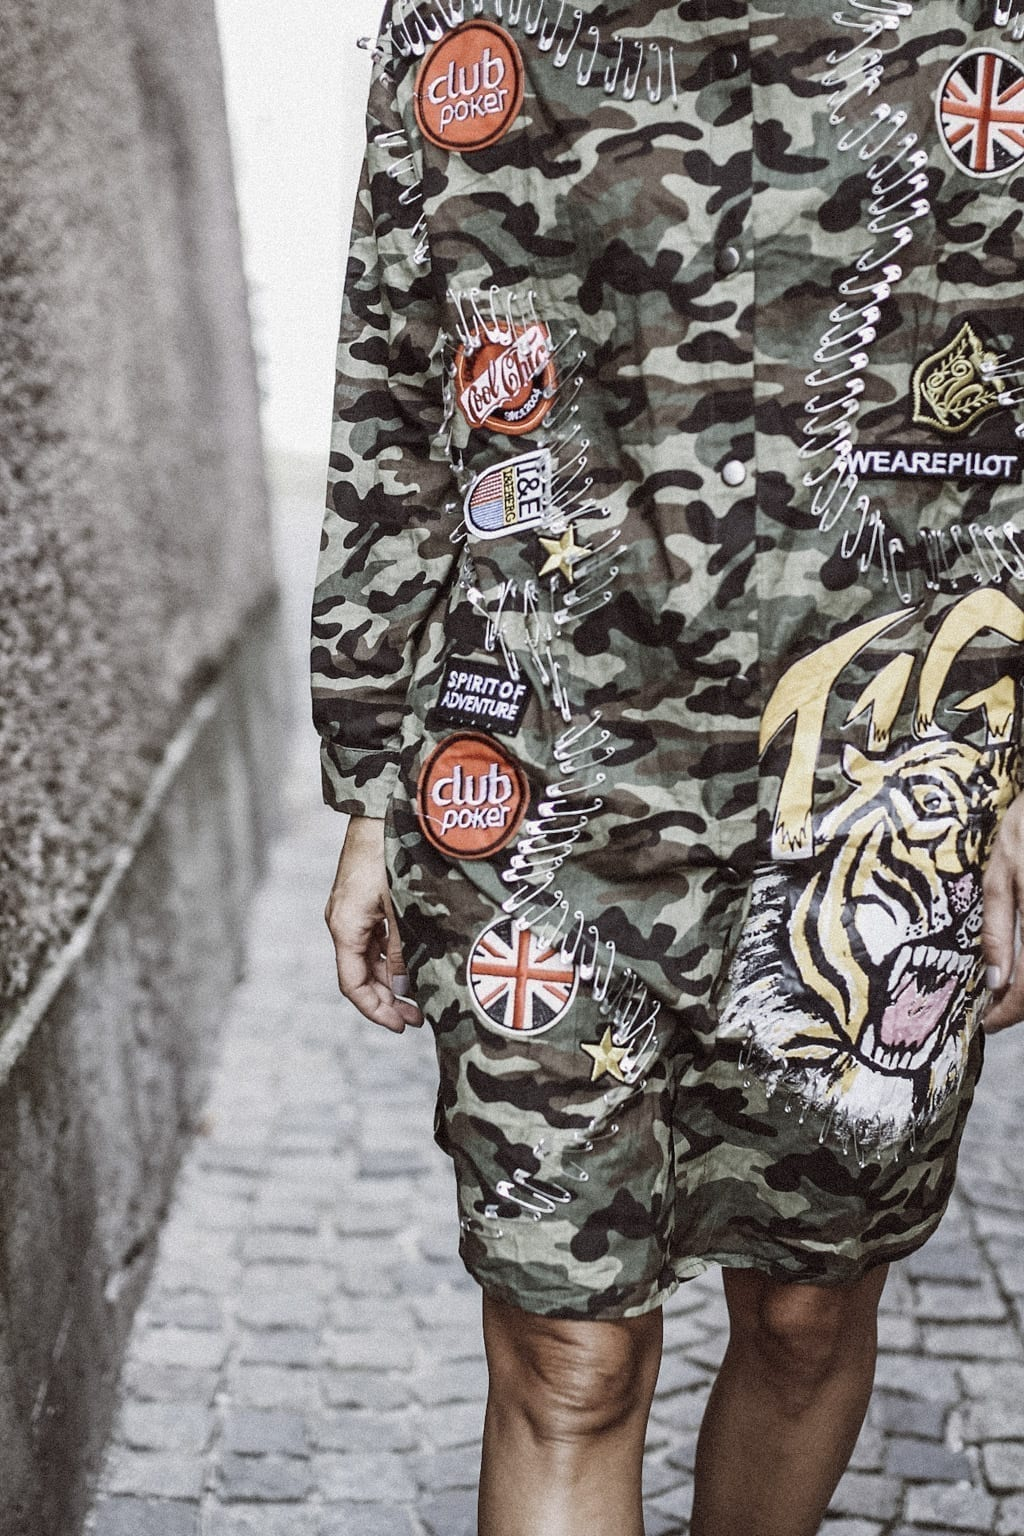 CK-1606_salzburg-fashion-street-style-look-magazine-karin-kaswurm-electric-love-2016-festival-camouflage-military-jacket-8931